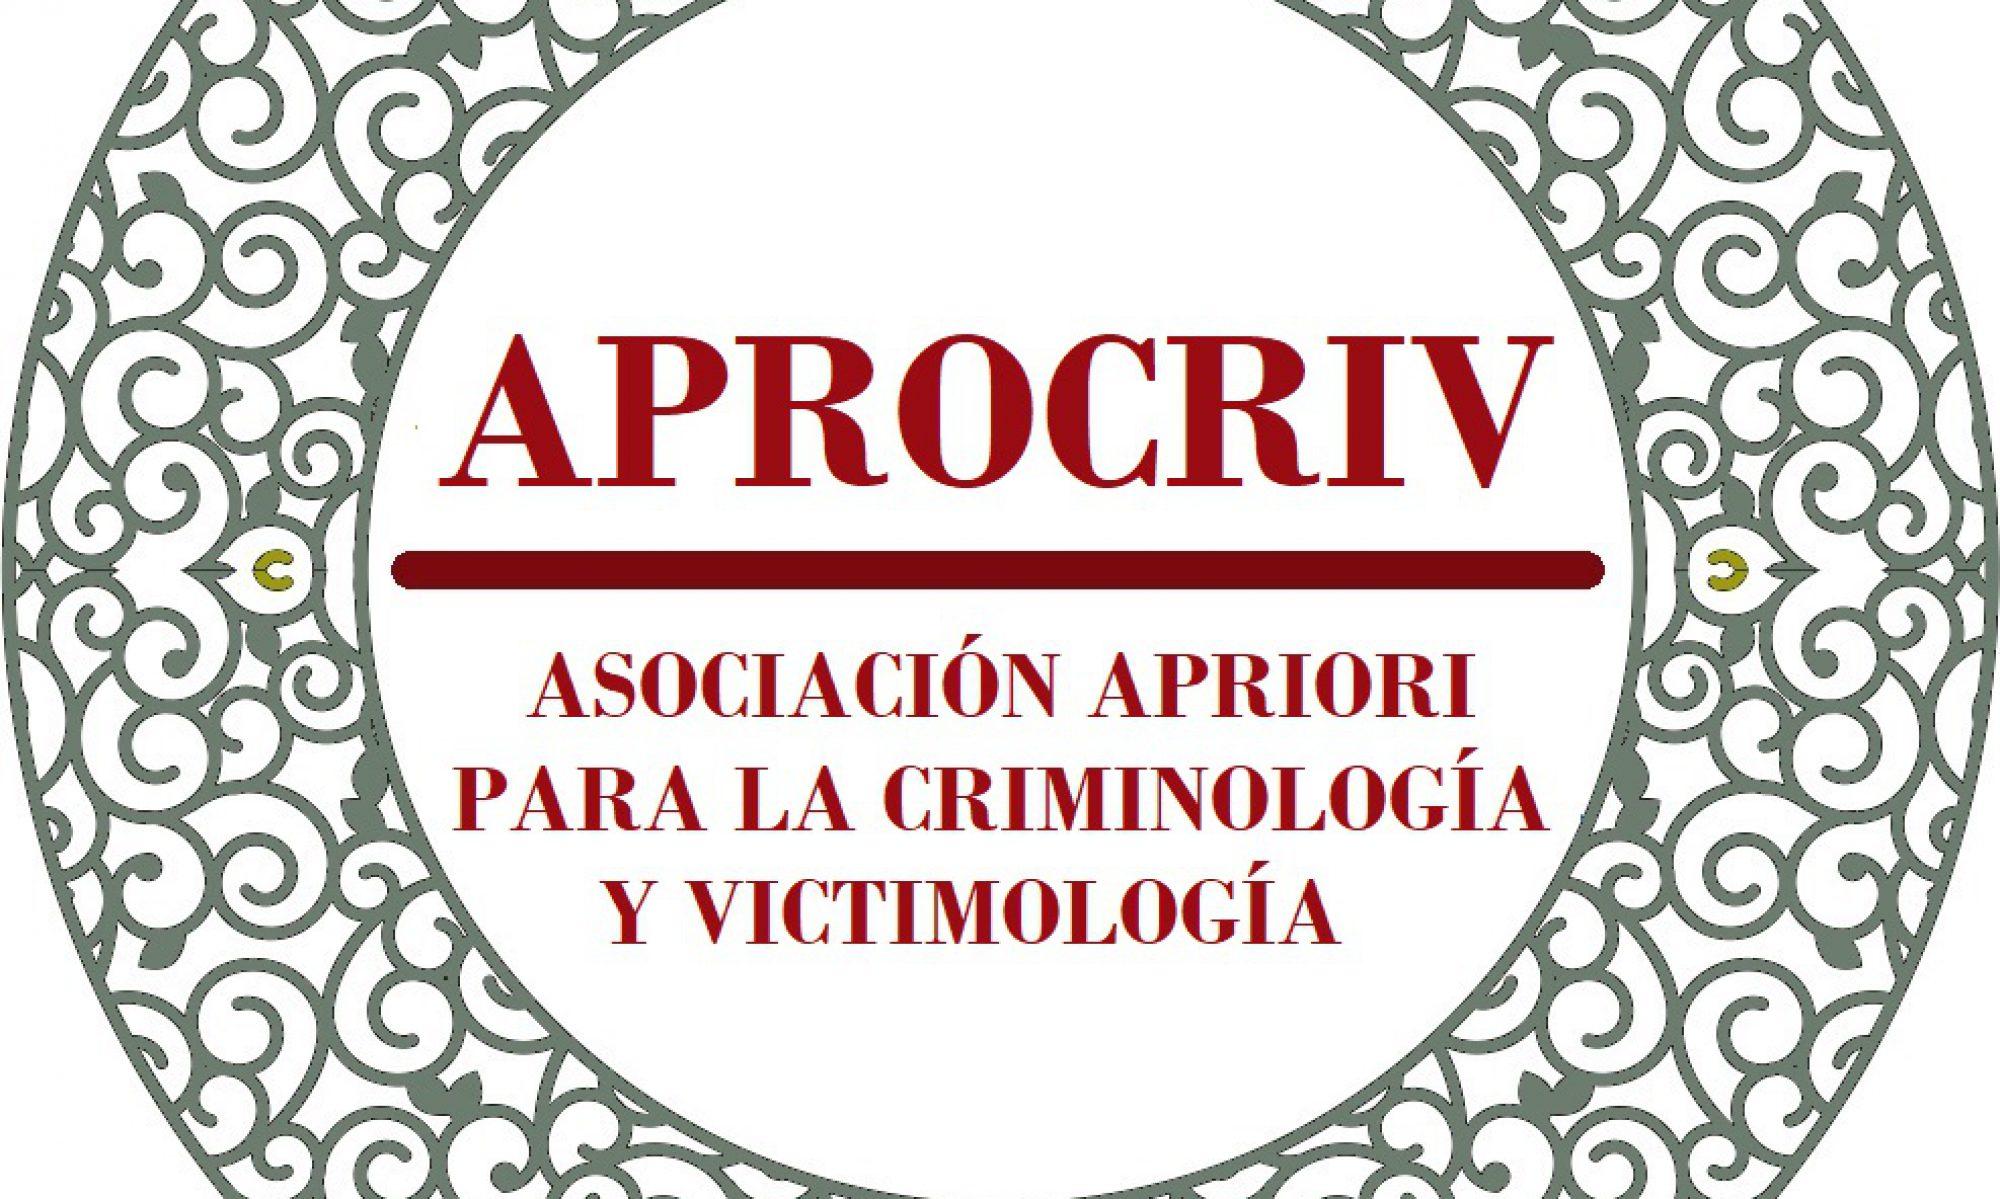 APROCRIV